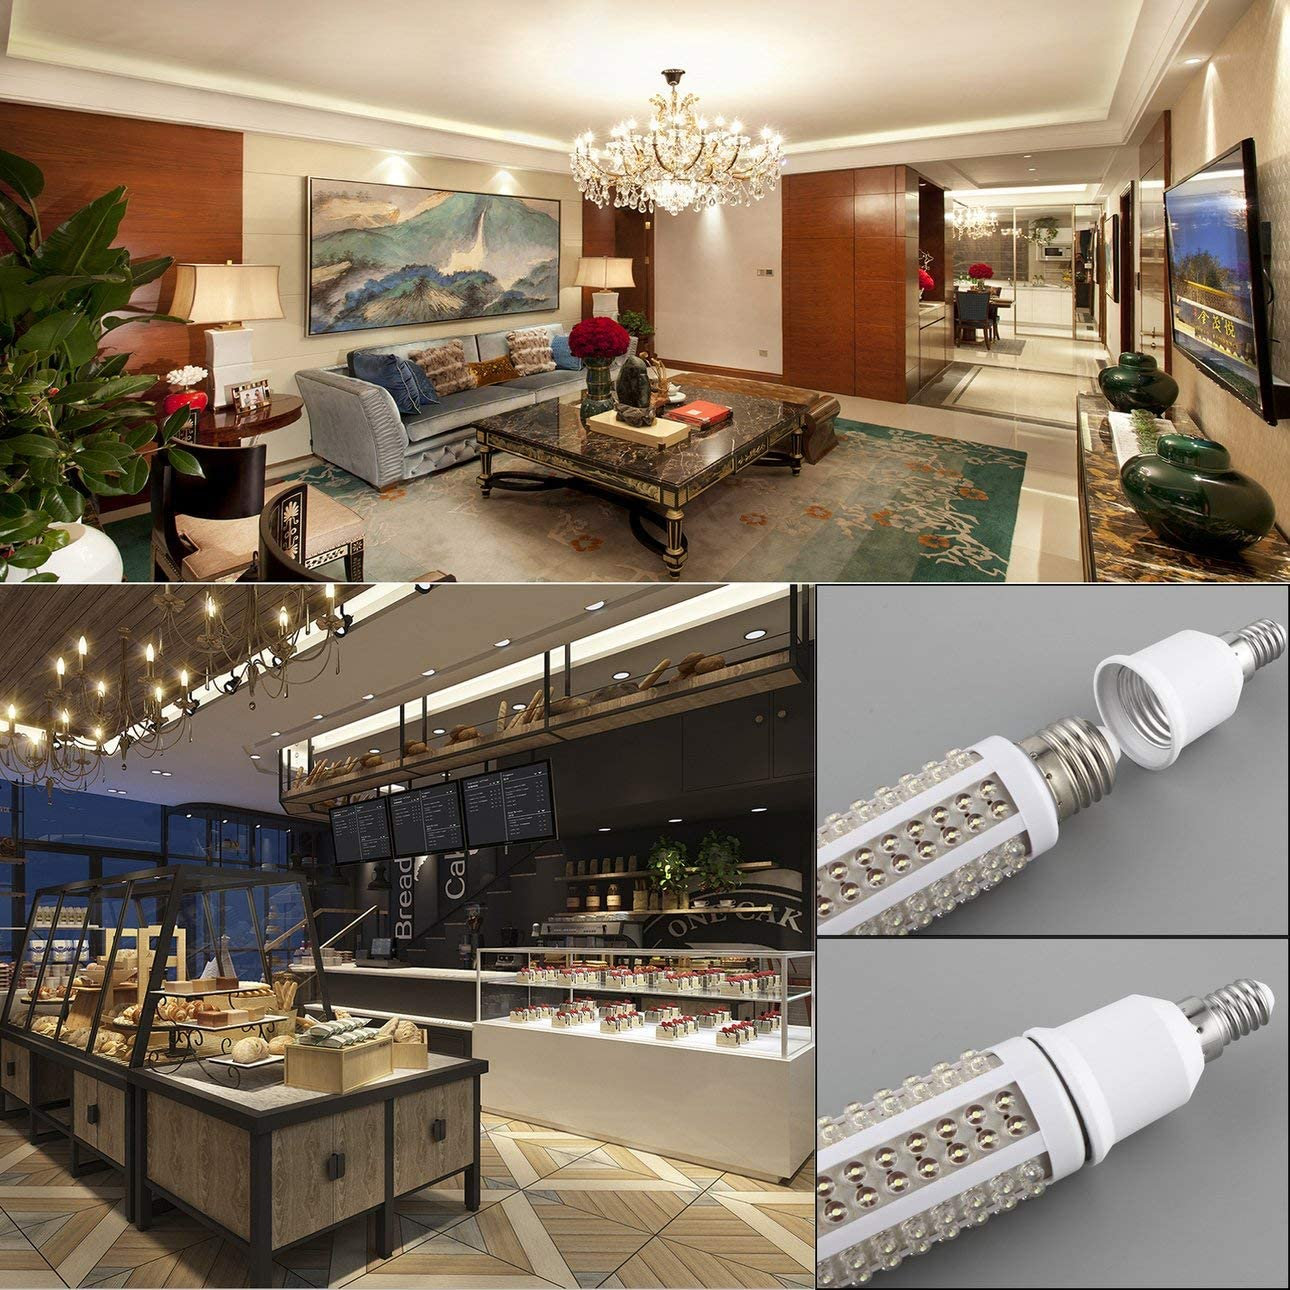 Lichtzubeh/ör tragbar langlebig Liaght-Adapter Celerhuak E14 auf E27 Lampen-Halterung professionell